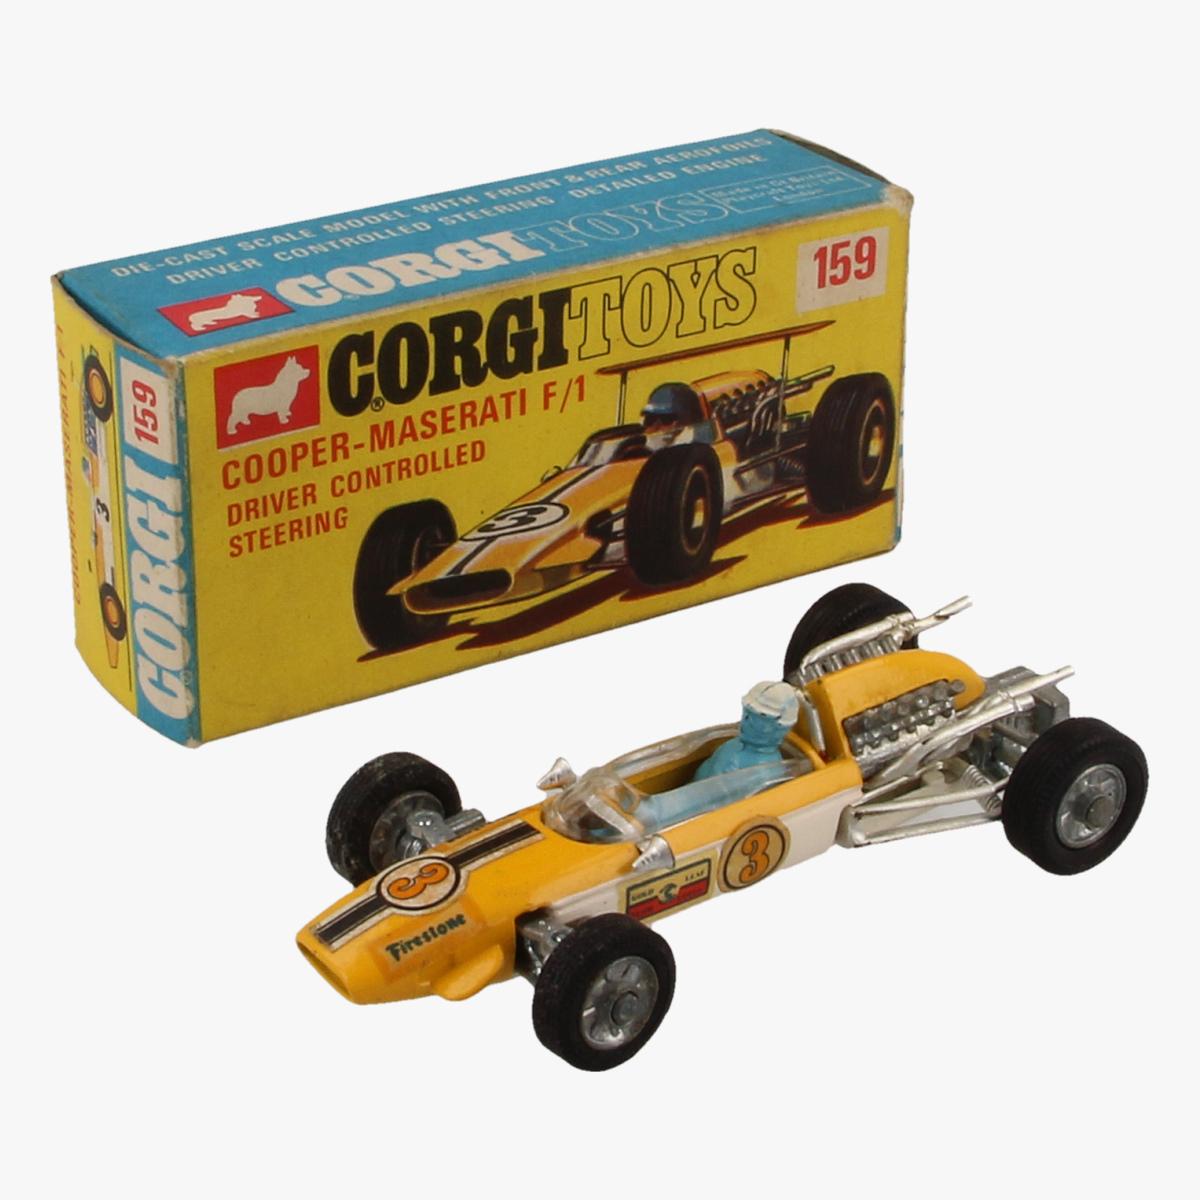 Afbeeldingen van Corgi Toys. Cooper Maserati F/1 Nr. 159